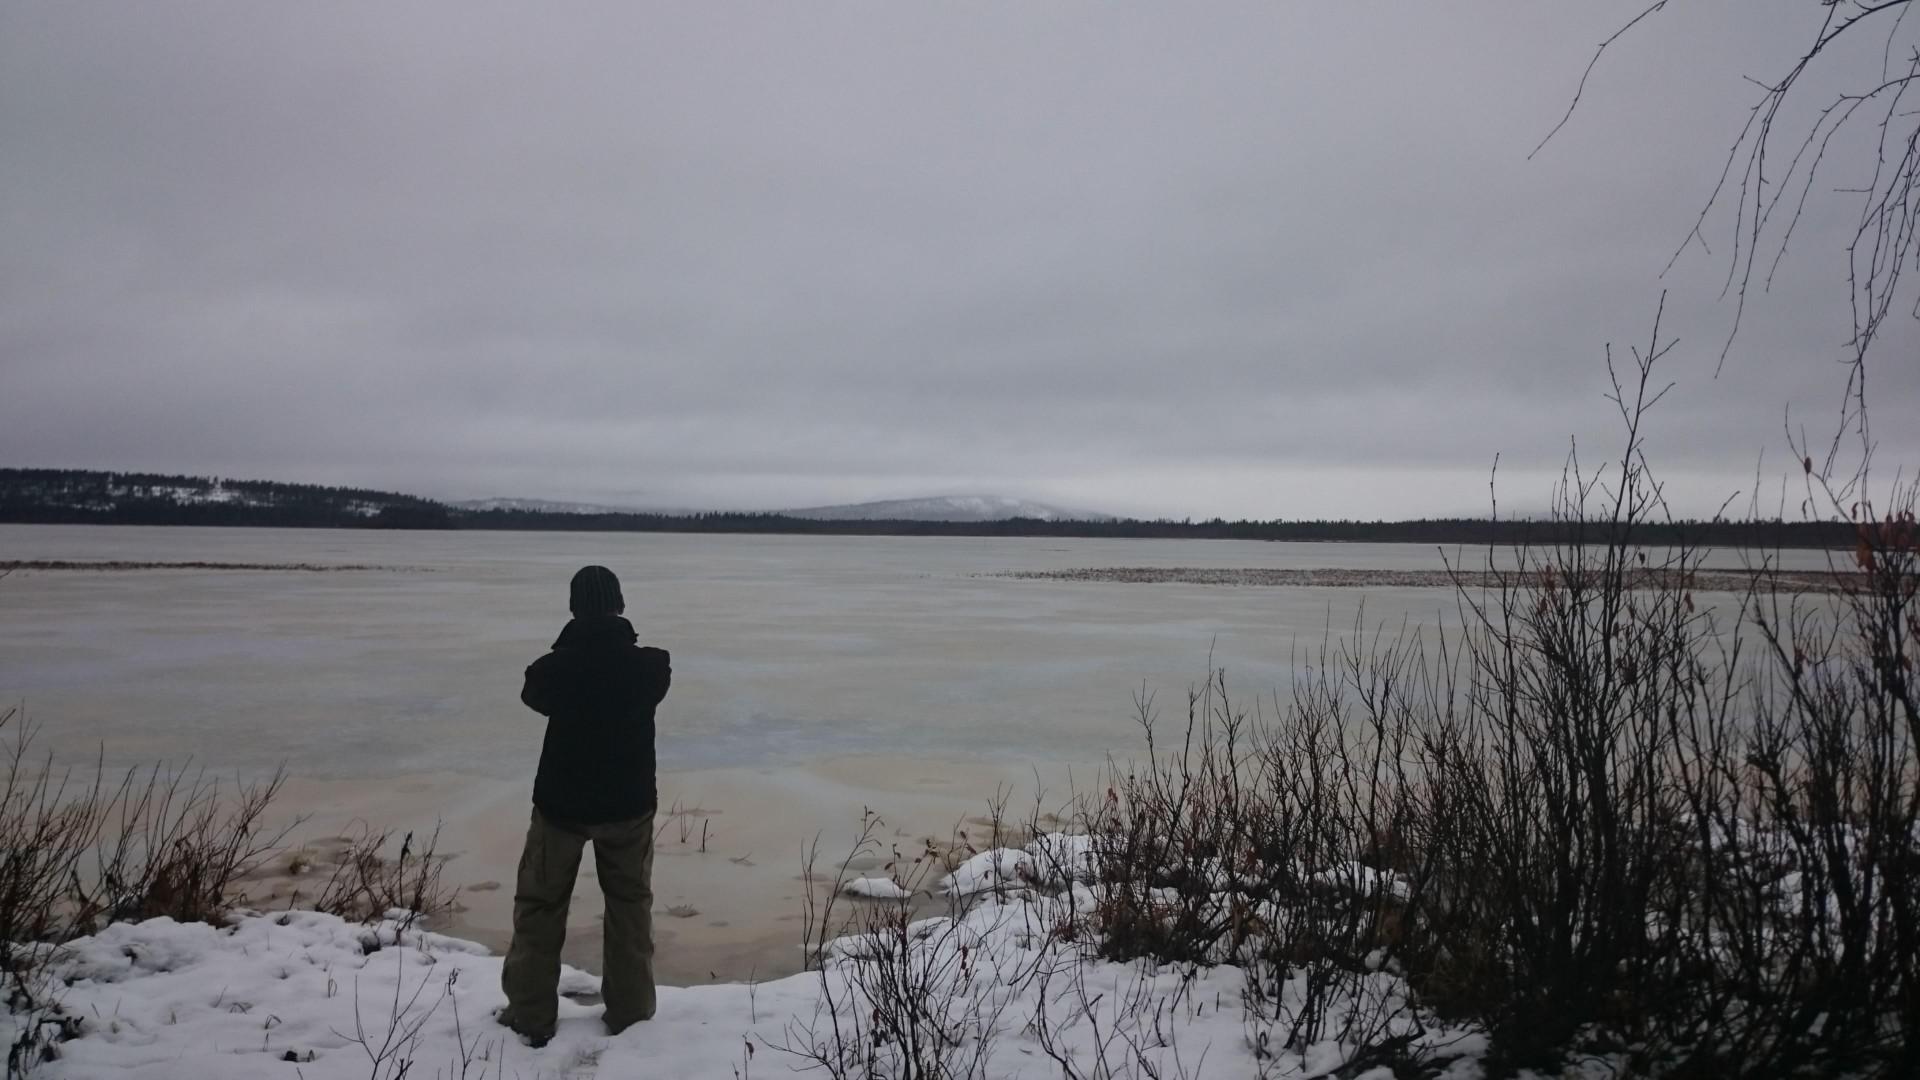 Valkea Lodge, Lapland, November